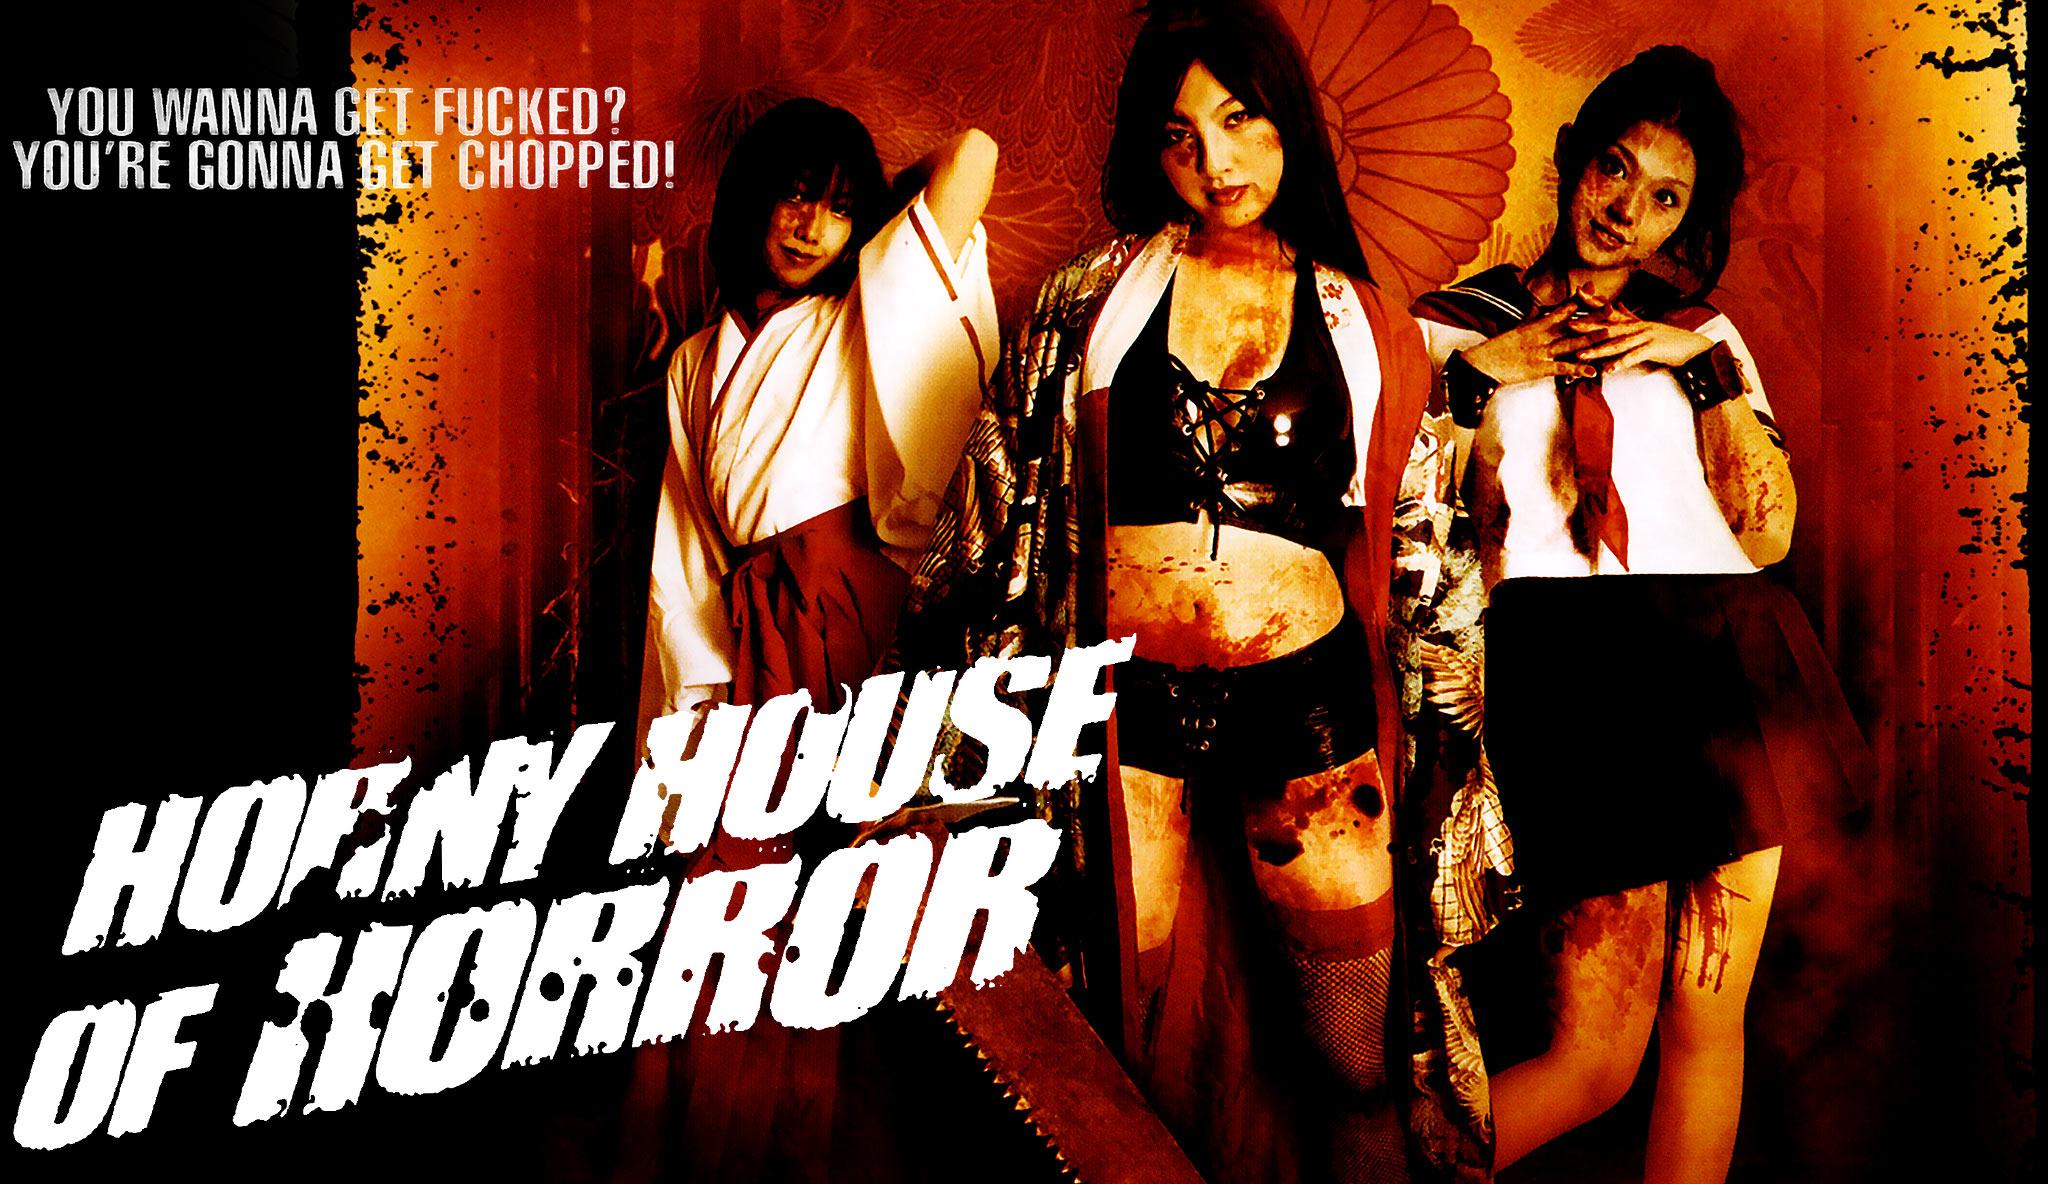 horny-house-of-horror\header.jpg